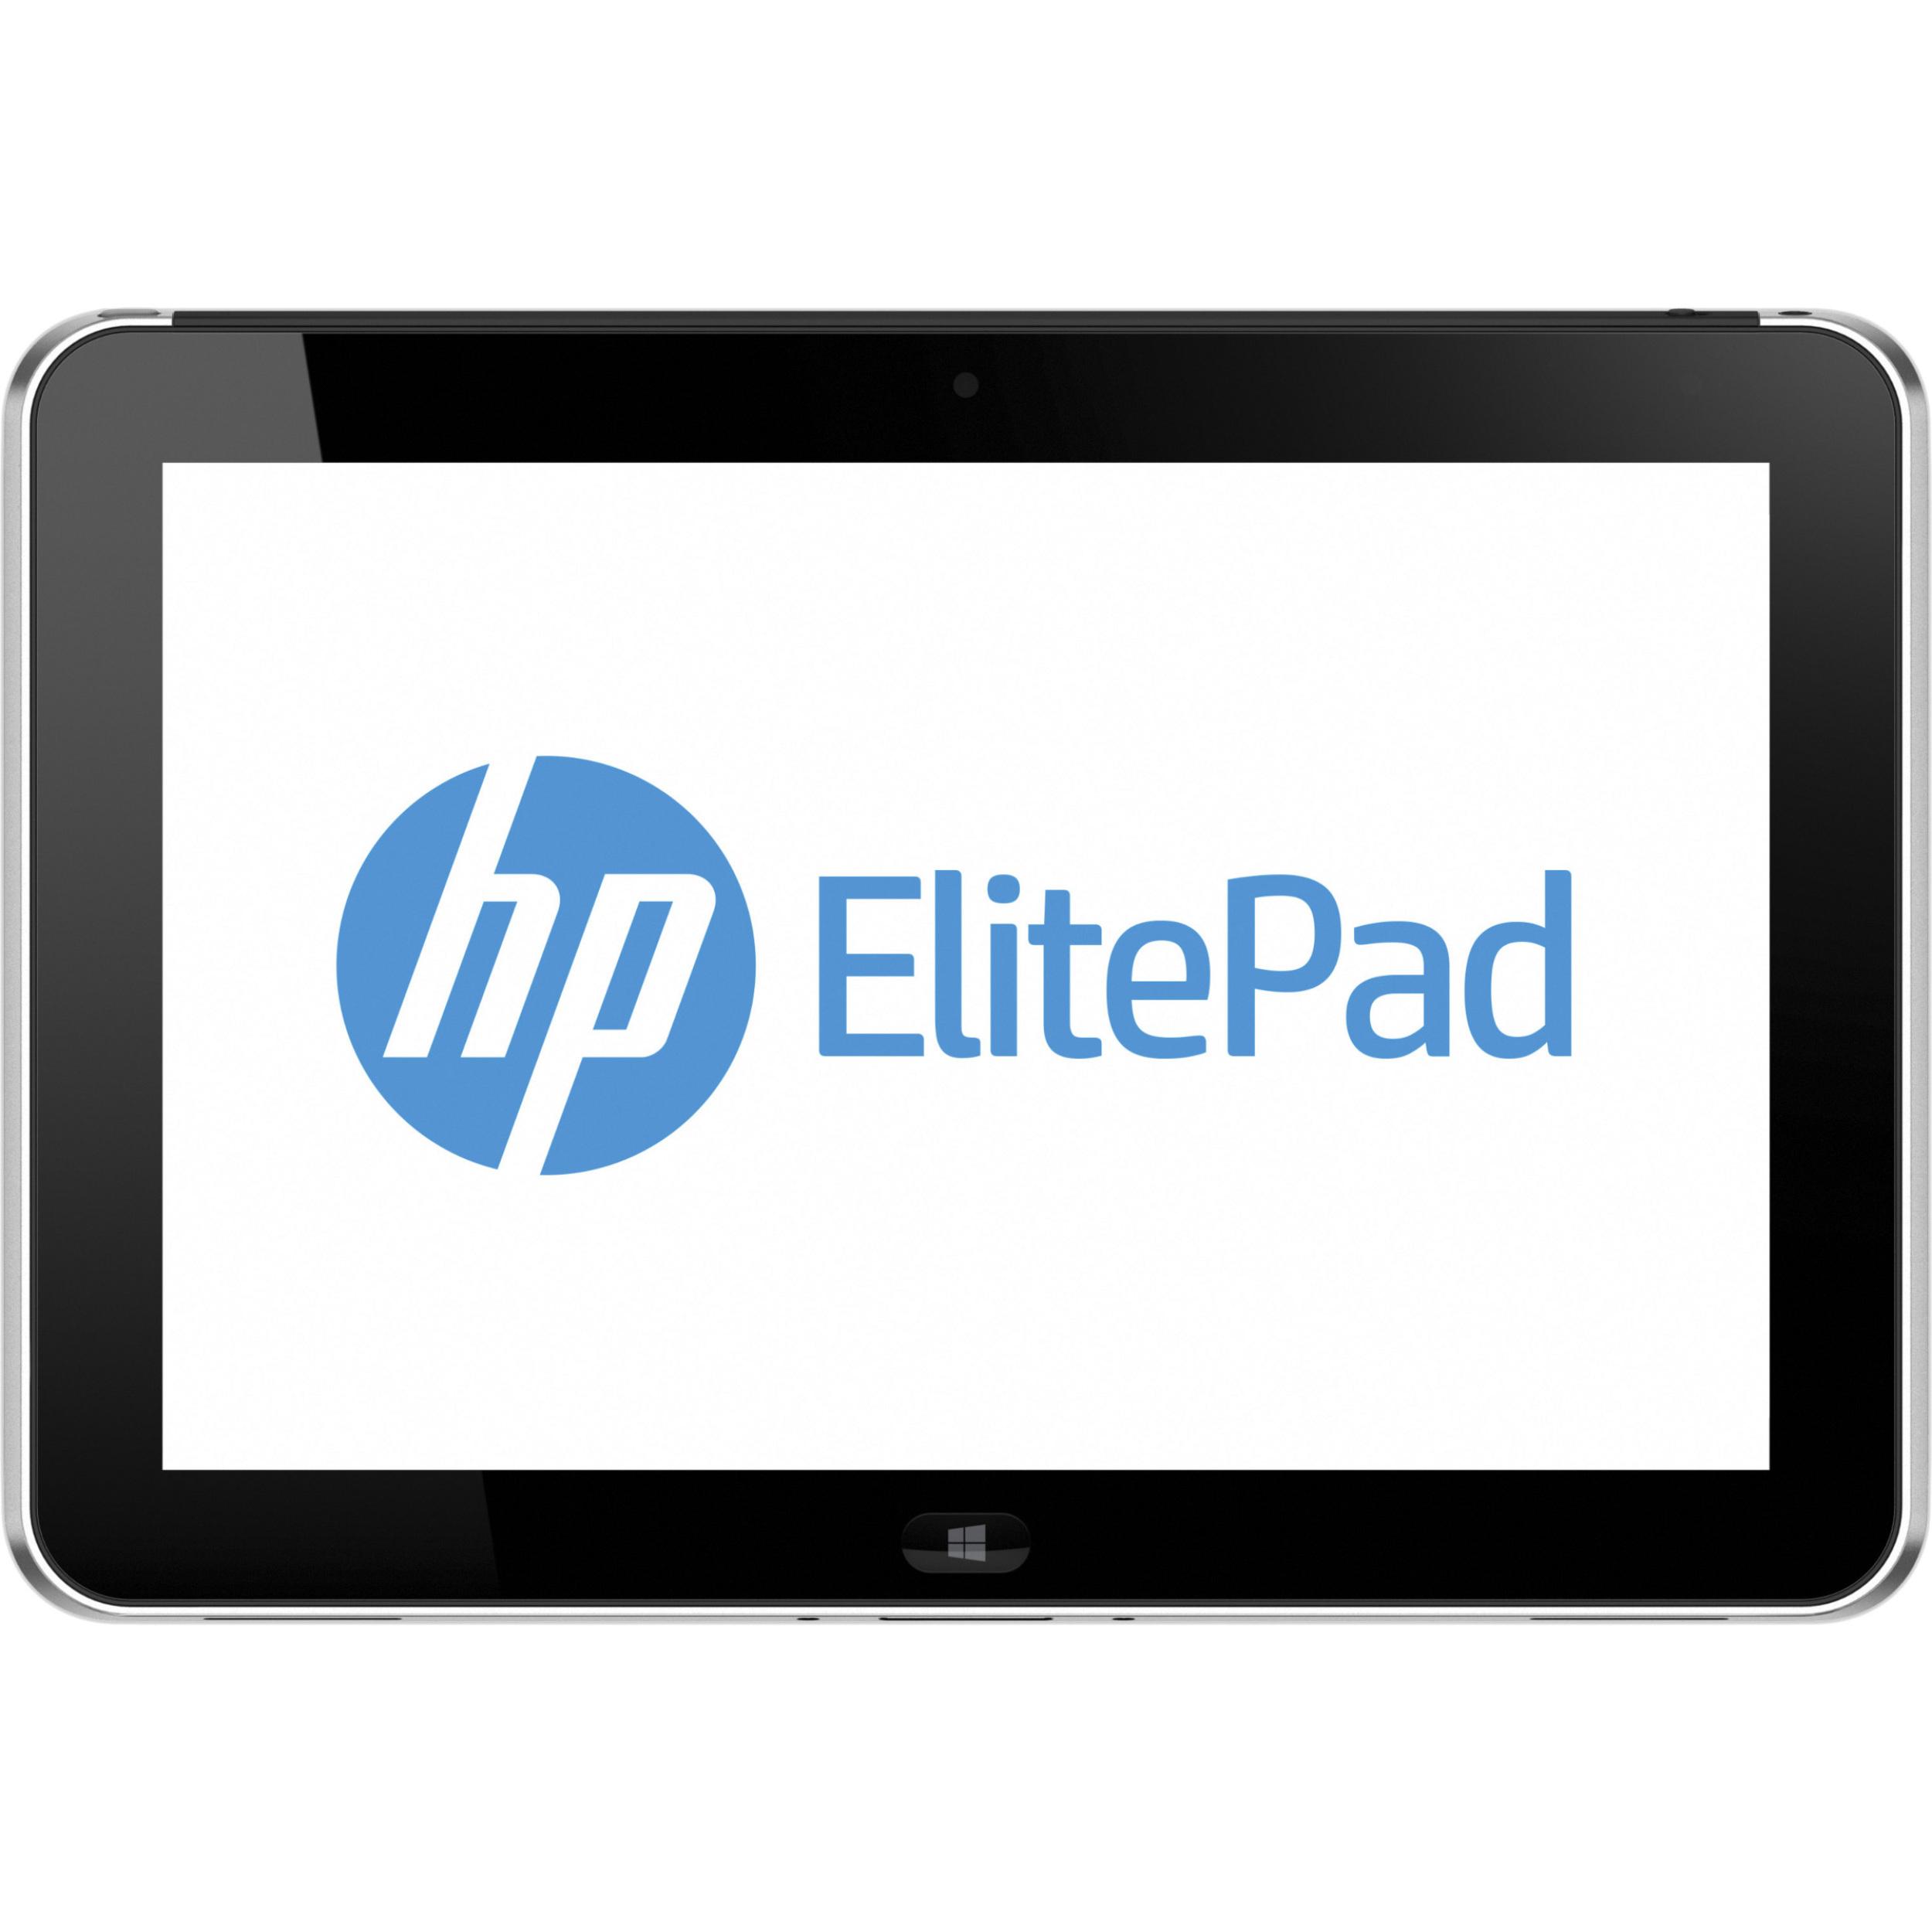 "HP ElitePad 900 G1 Tablet - 10.1"" WXGA - 2 GB RAM - 64 GB Storage (Refurbished)"